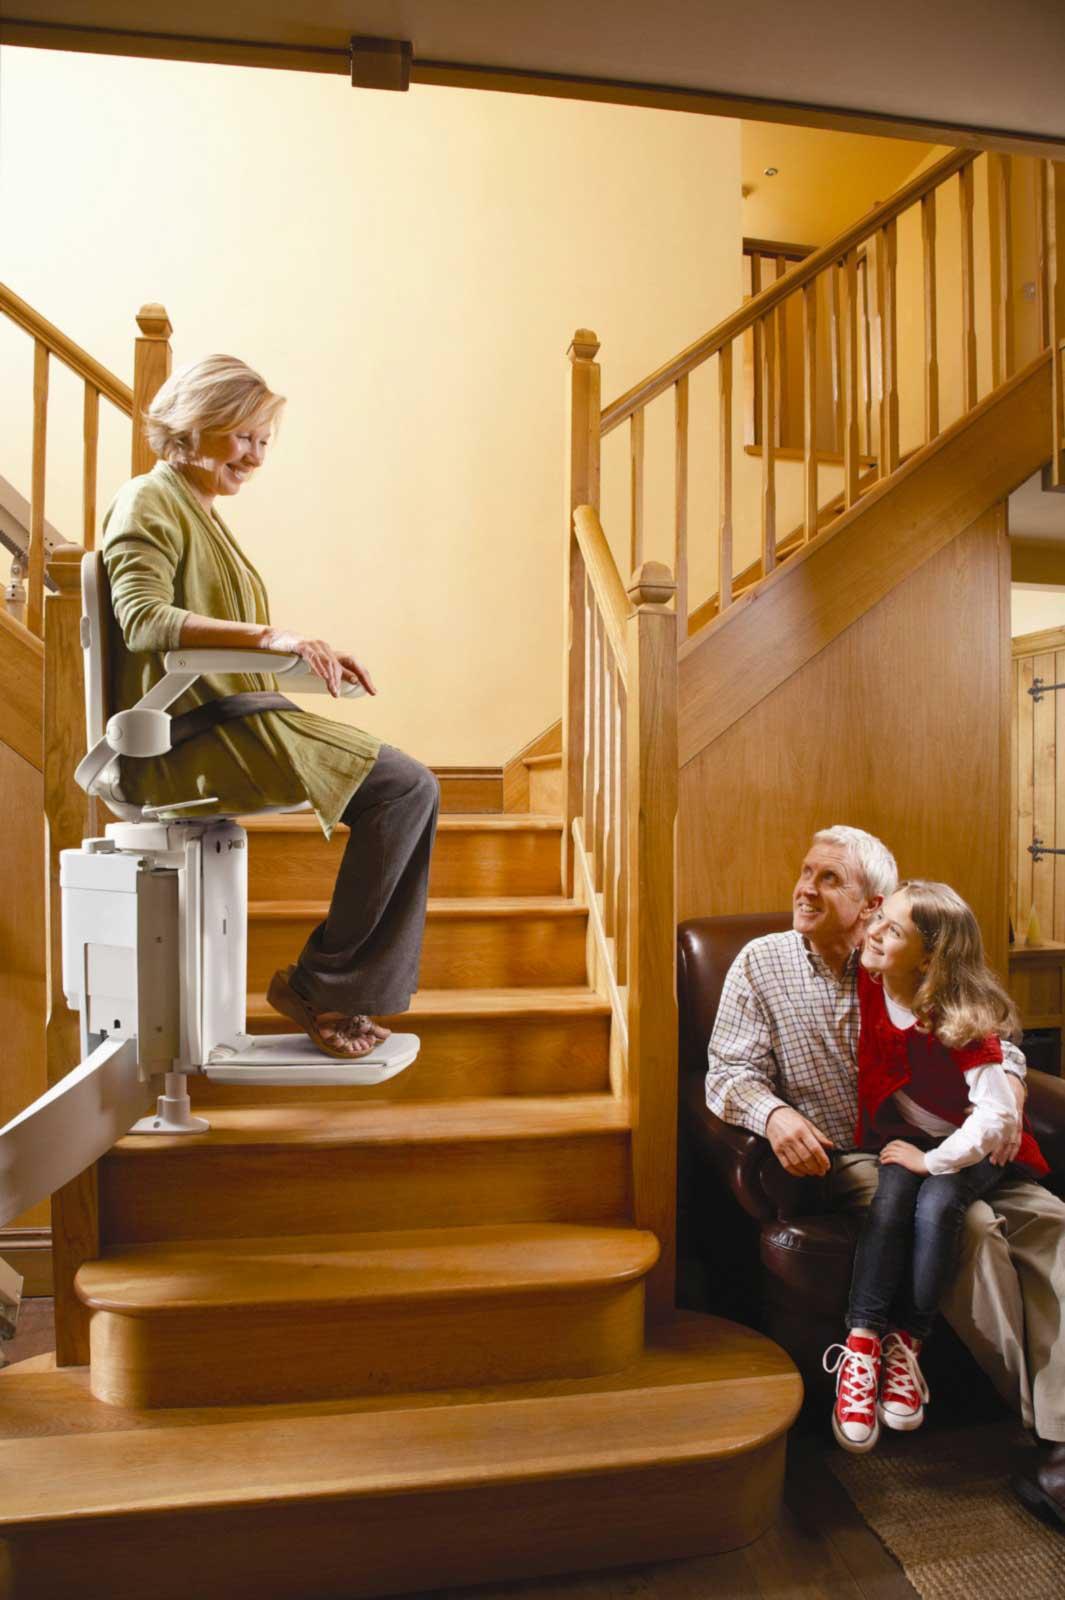 monte escalier paris